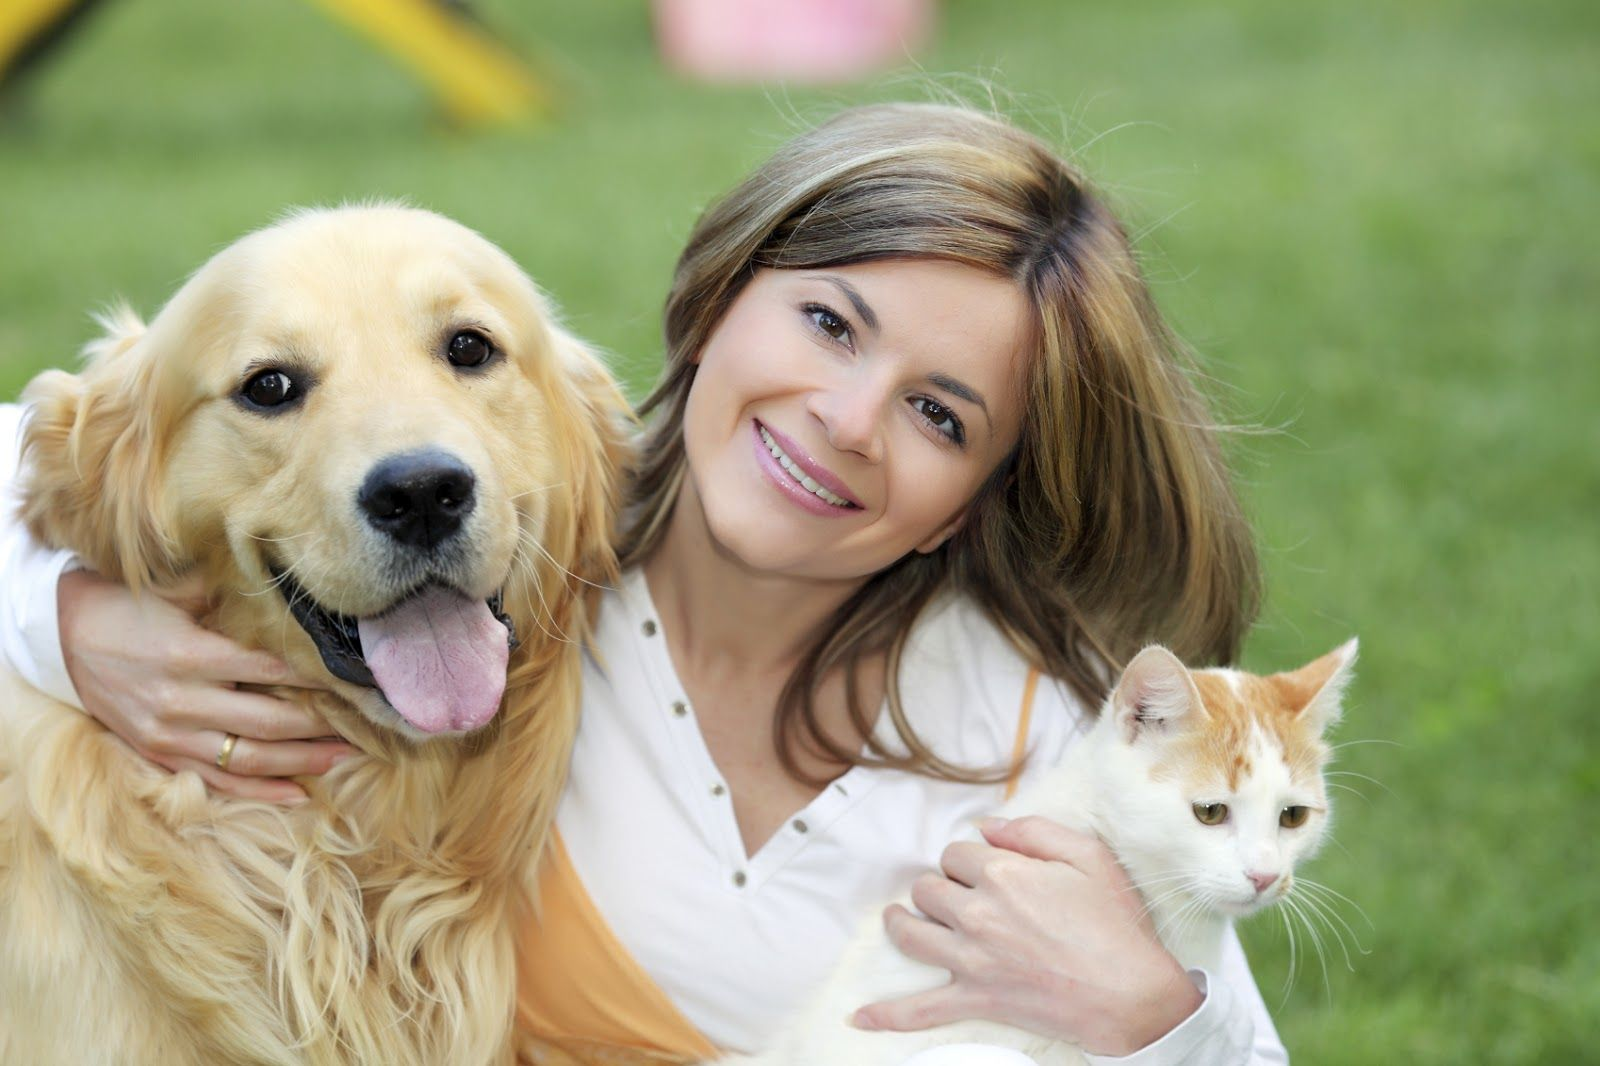 Pets Indoor Pets Dogs Happy Animals